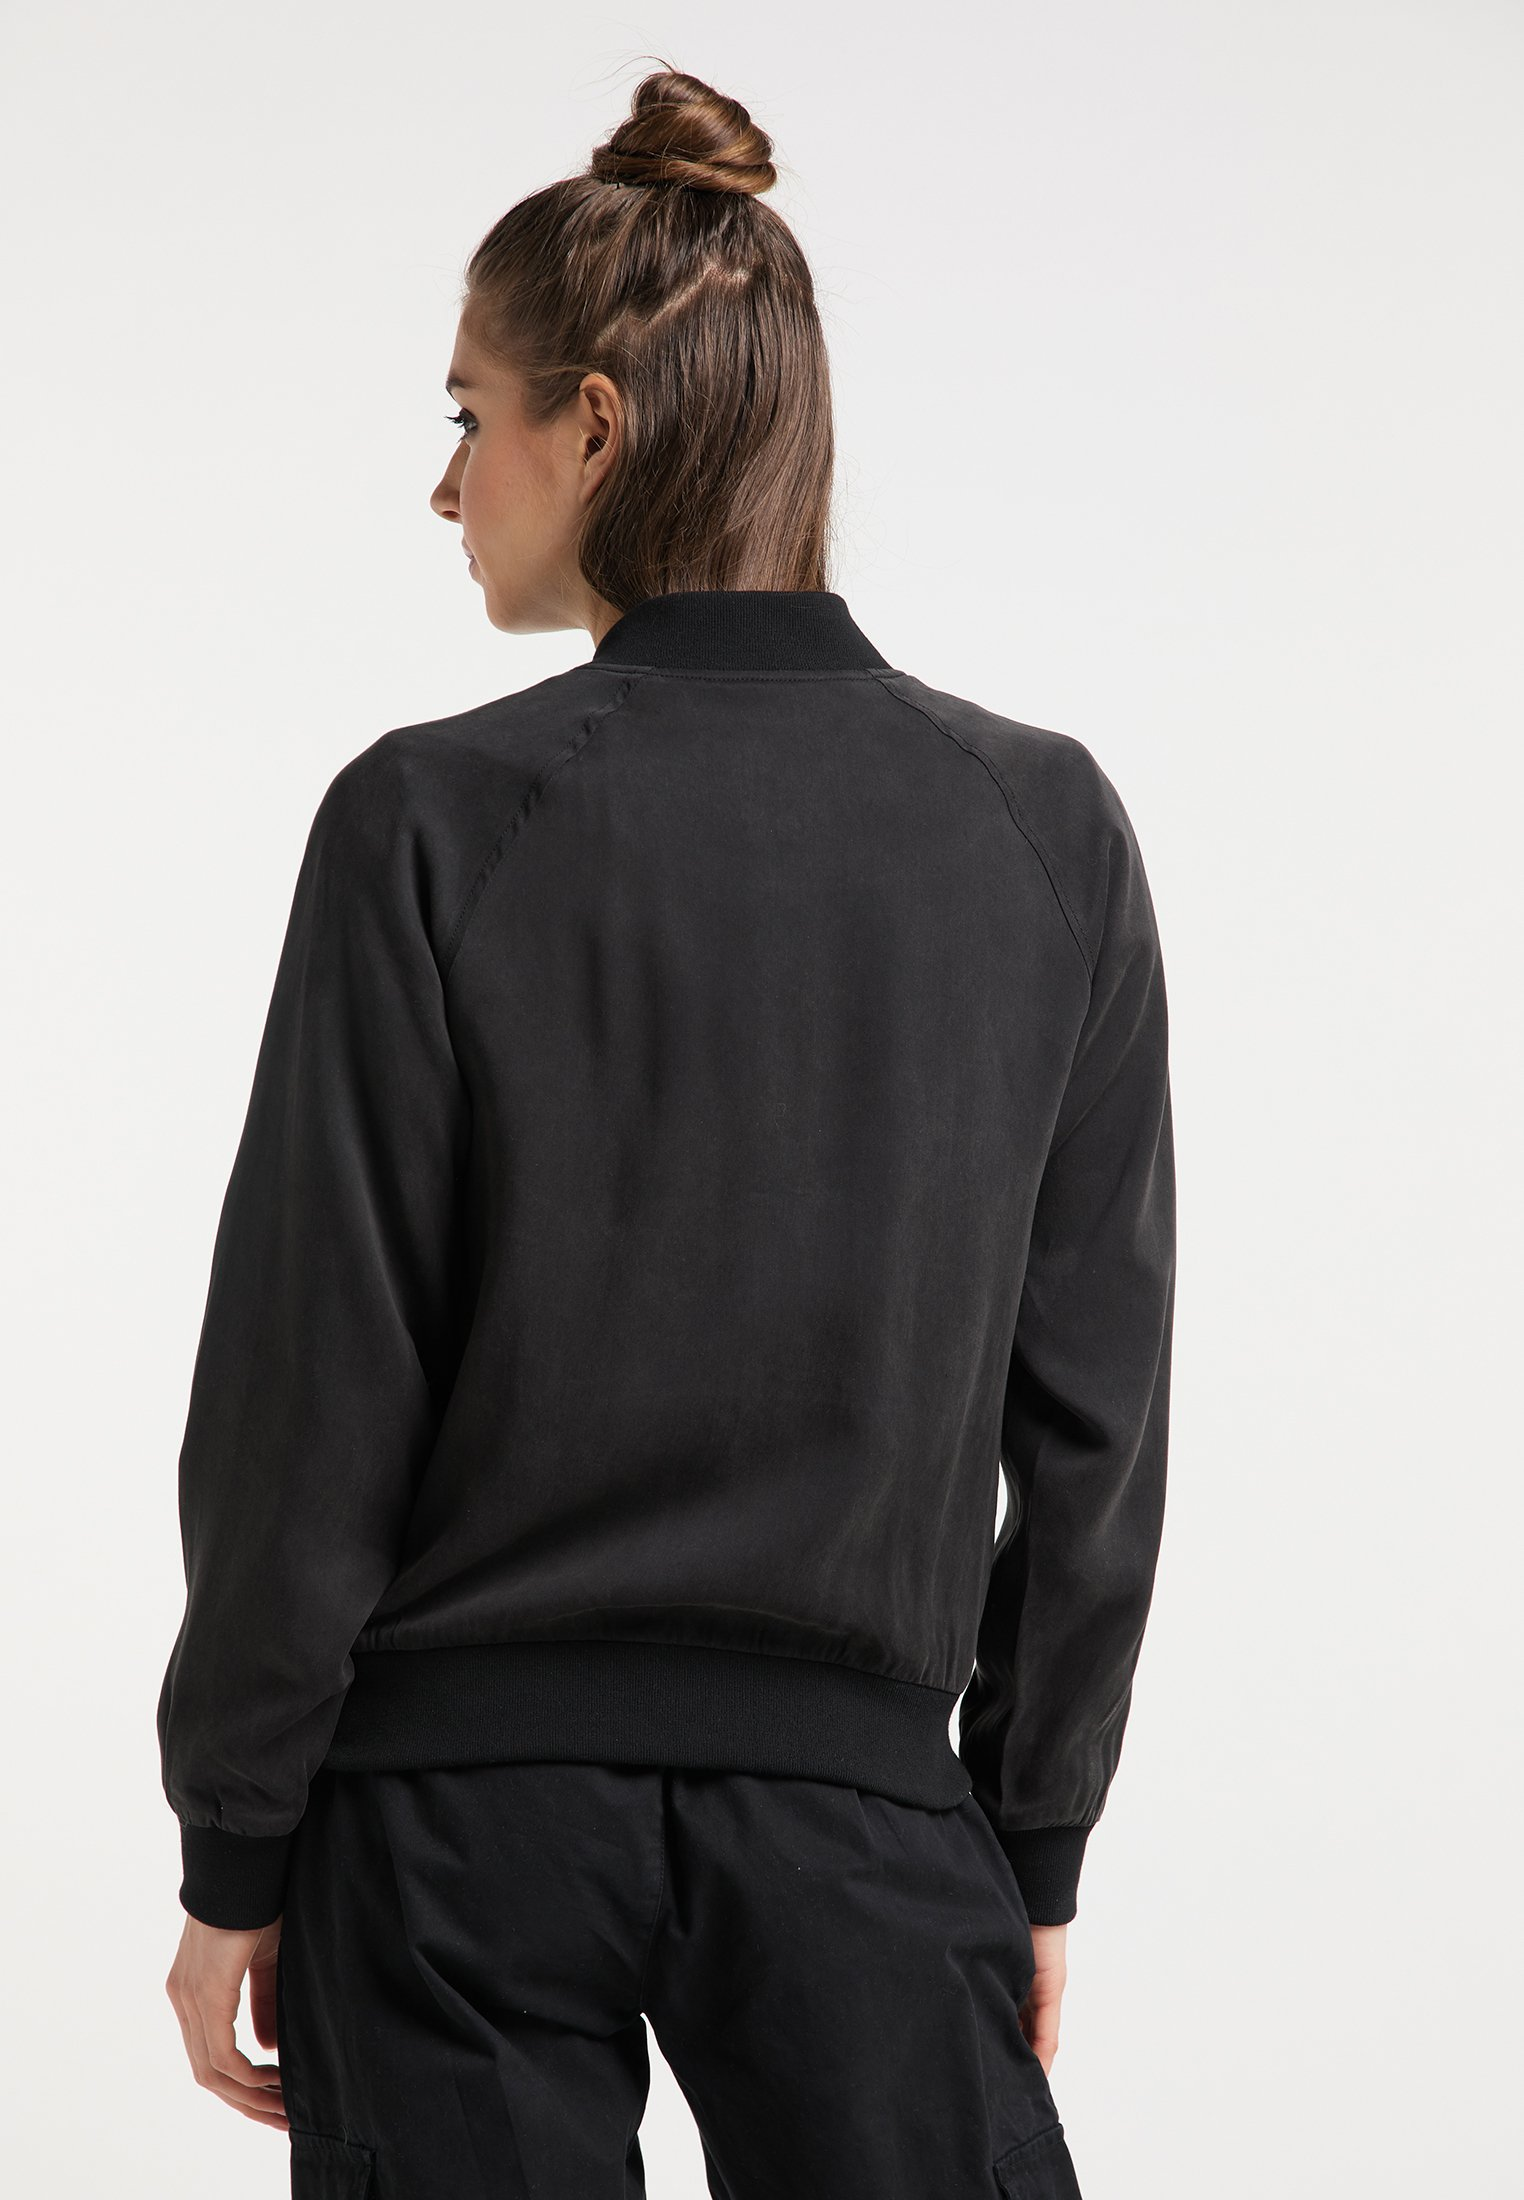 myMo Bomberjacke - black | Damenbekleidung billig